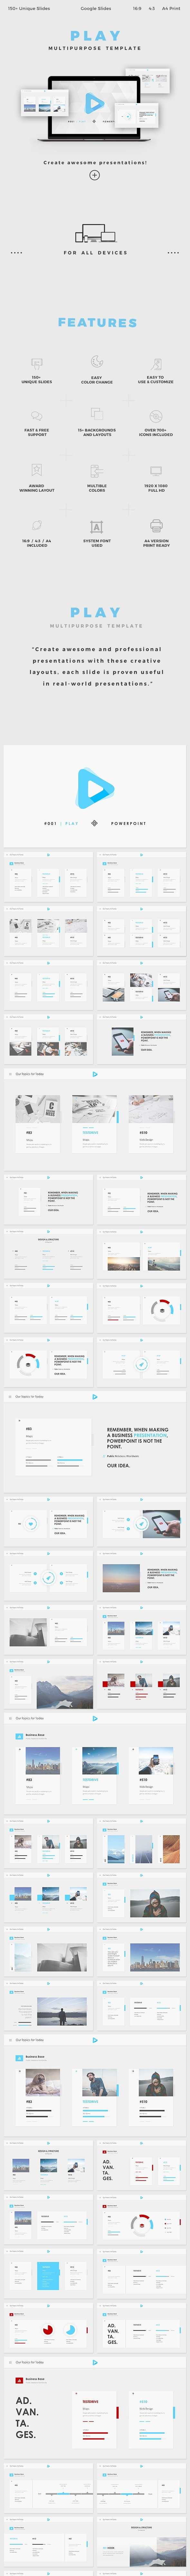 Play Google Slides - Google Slides Presentation Templates